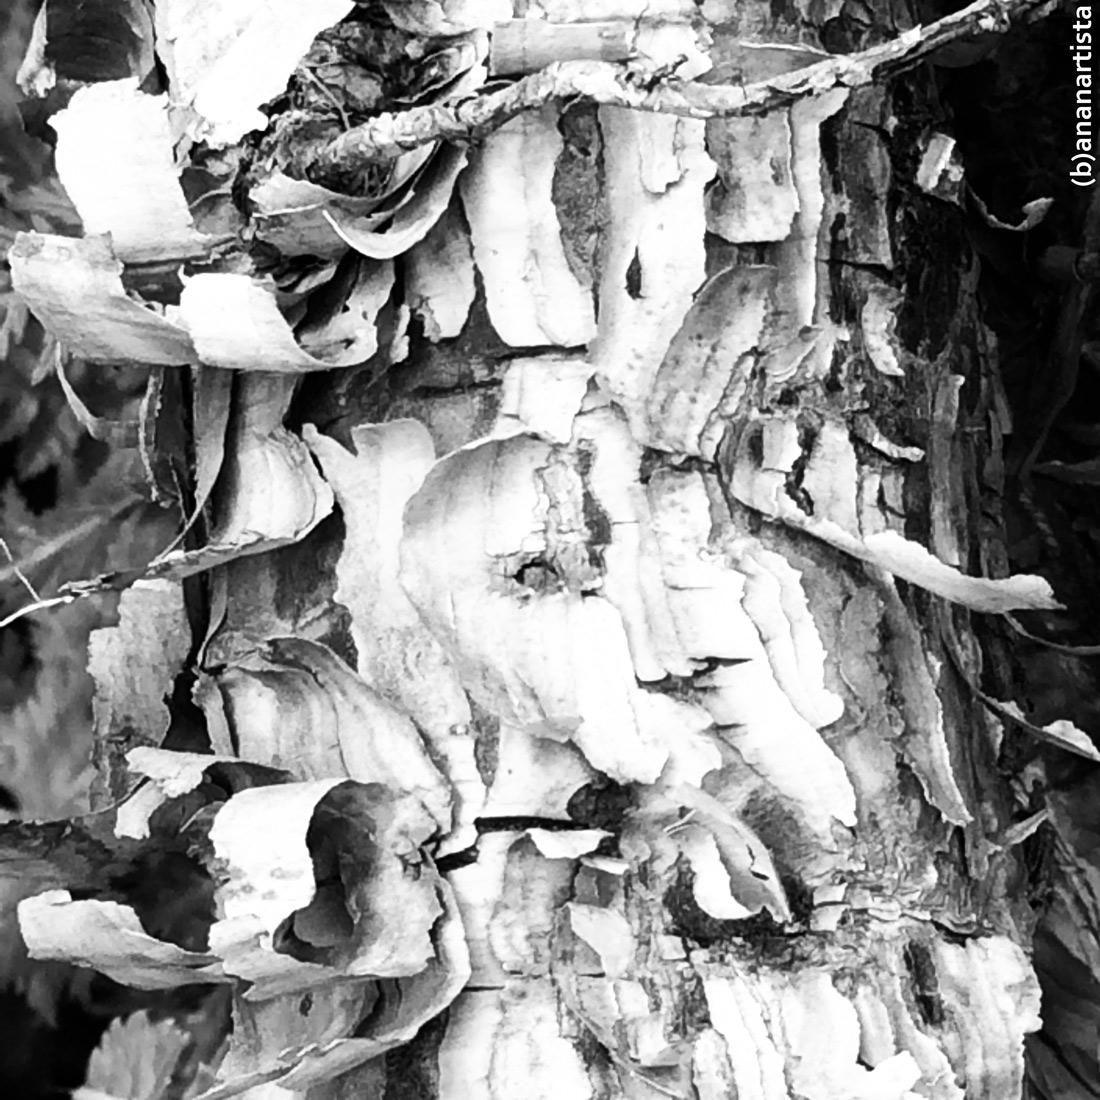 old bark: macro nature black and white photography art by (b)ananartista sbuff